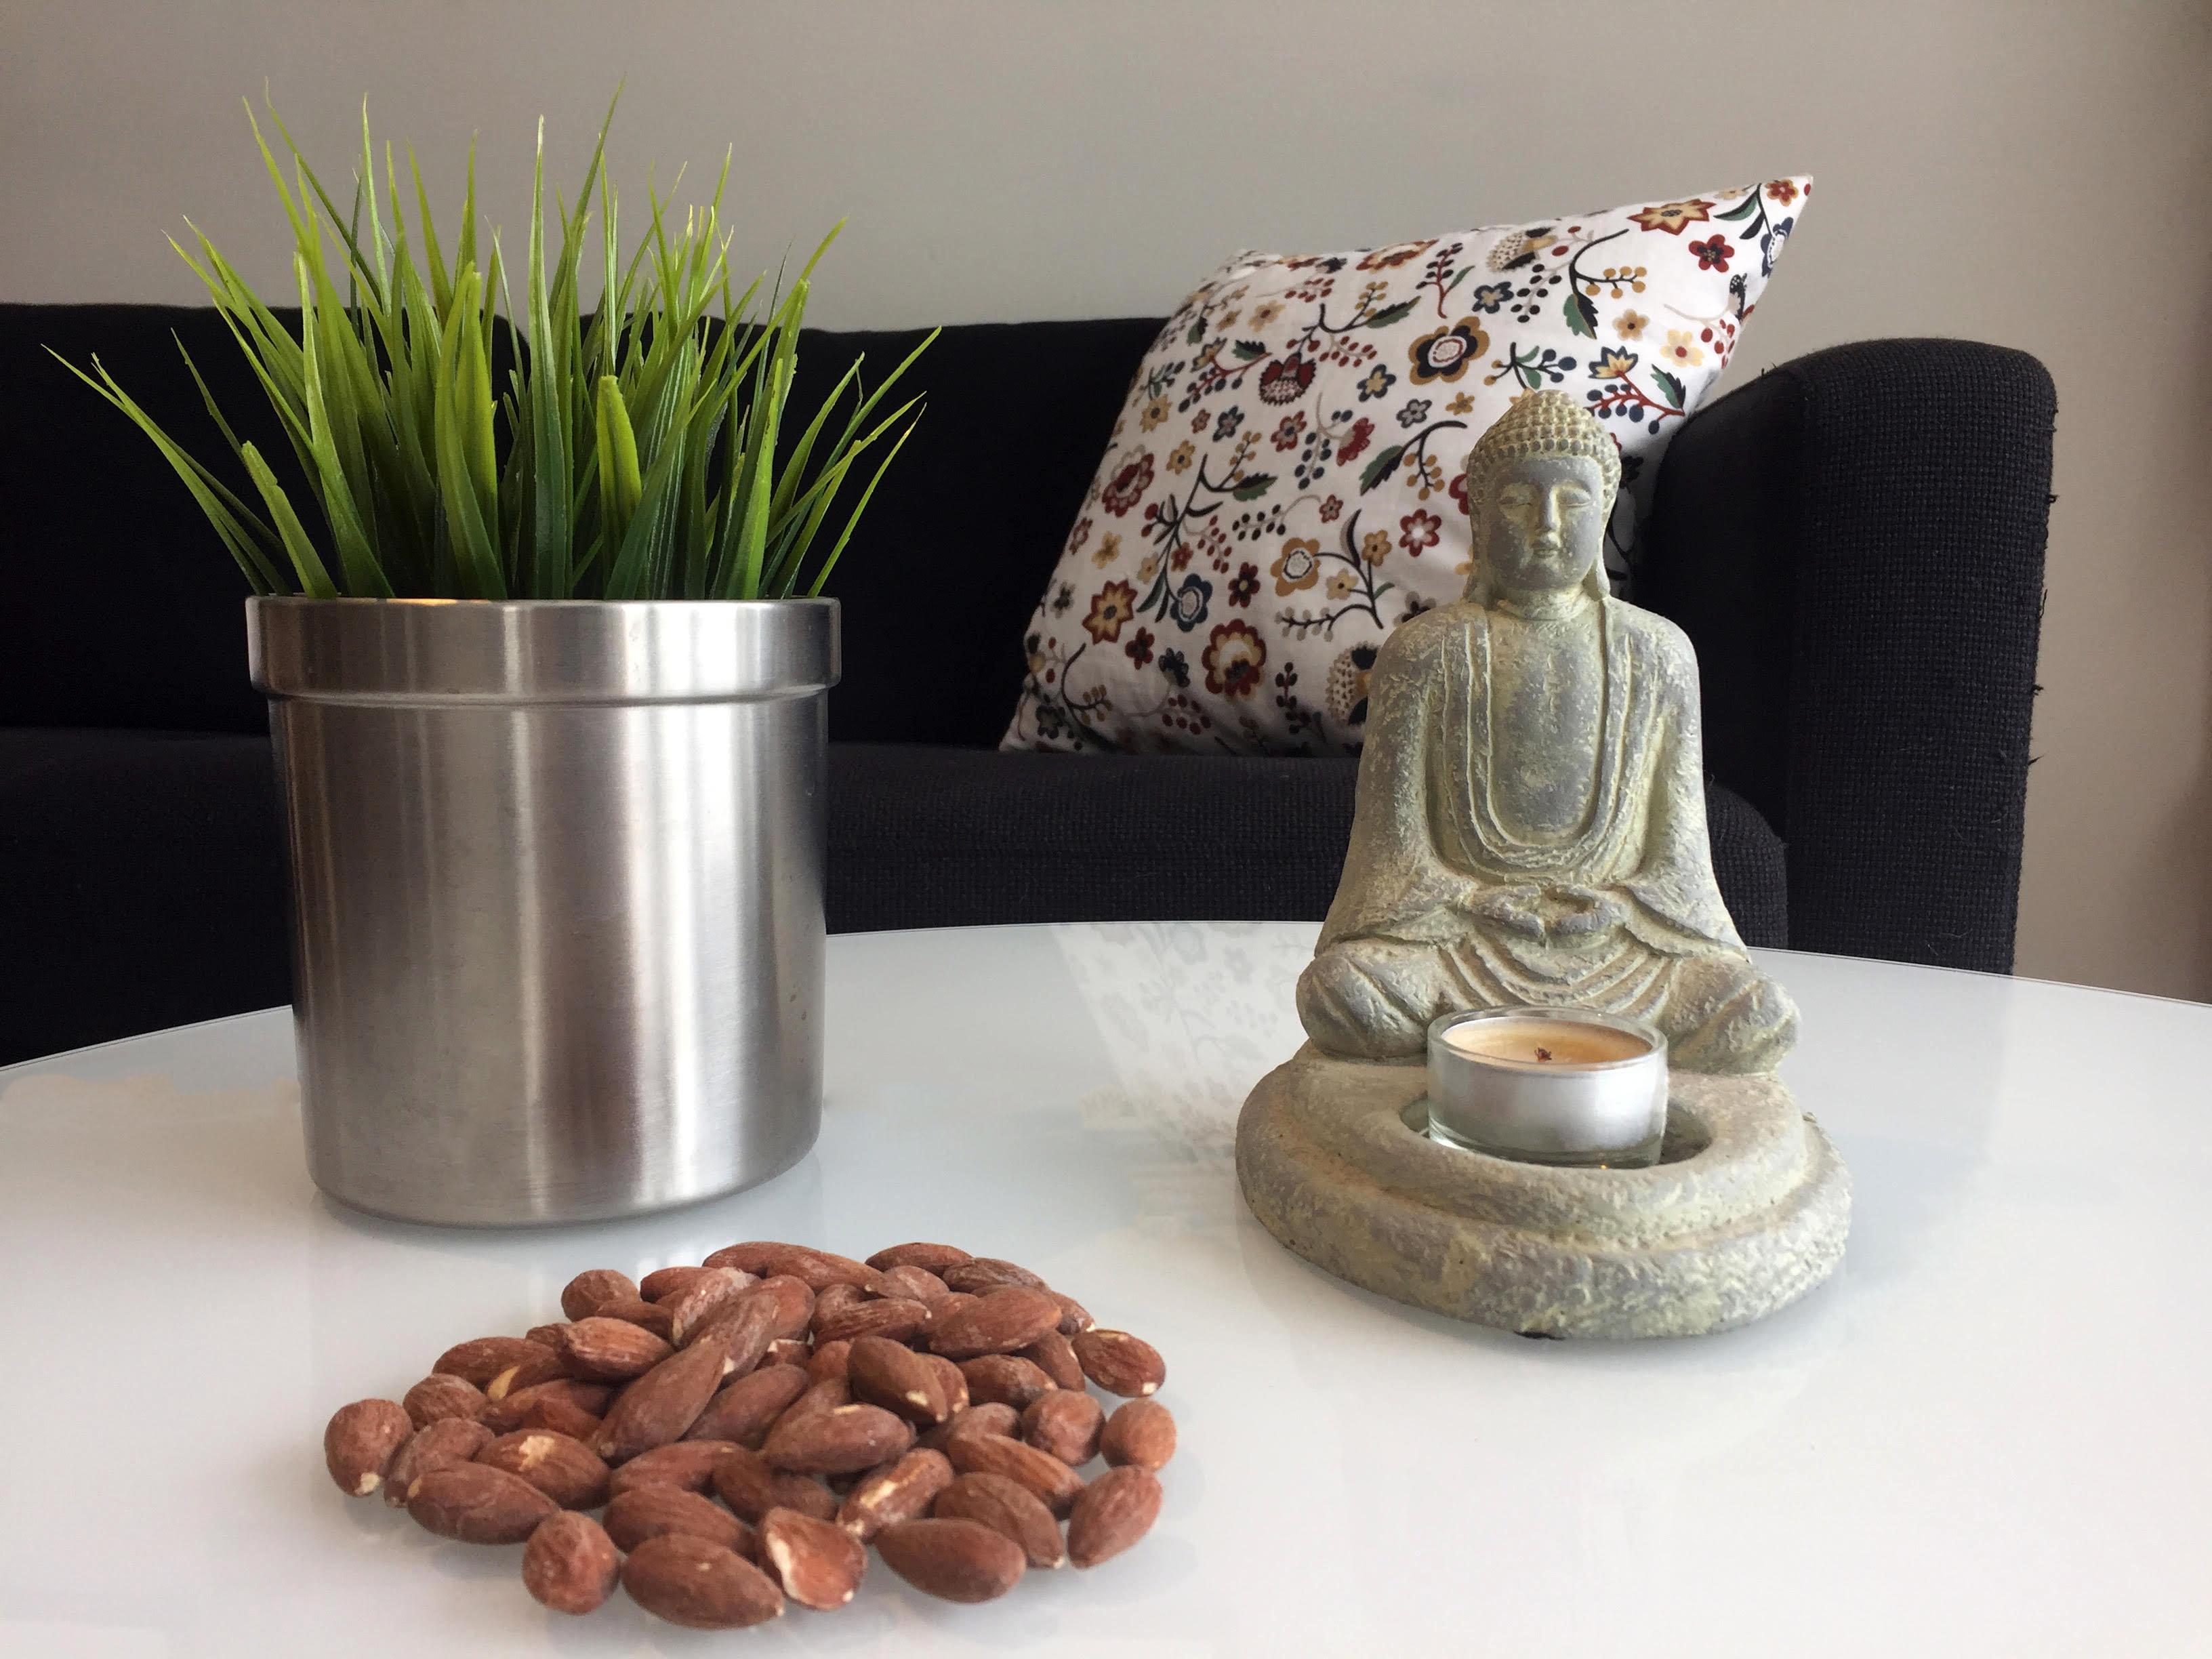 Plant, almonds and a buddha